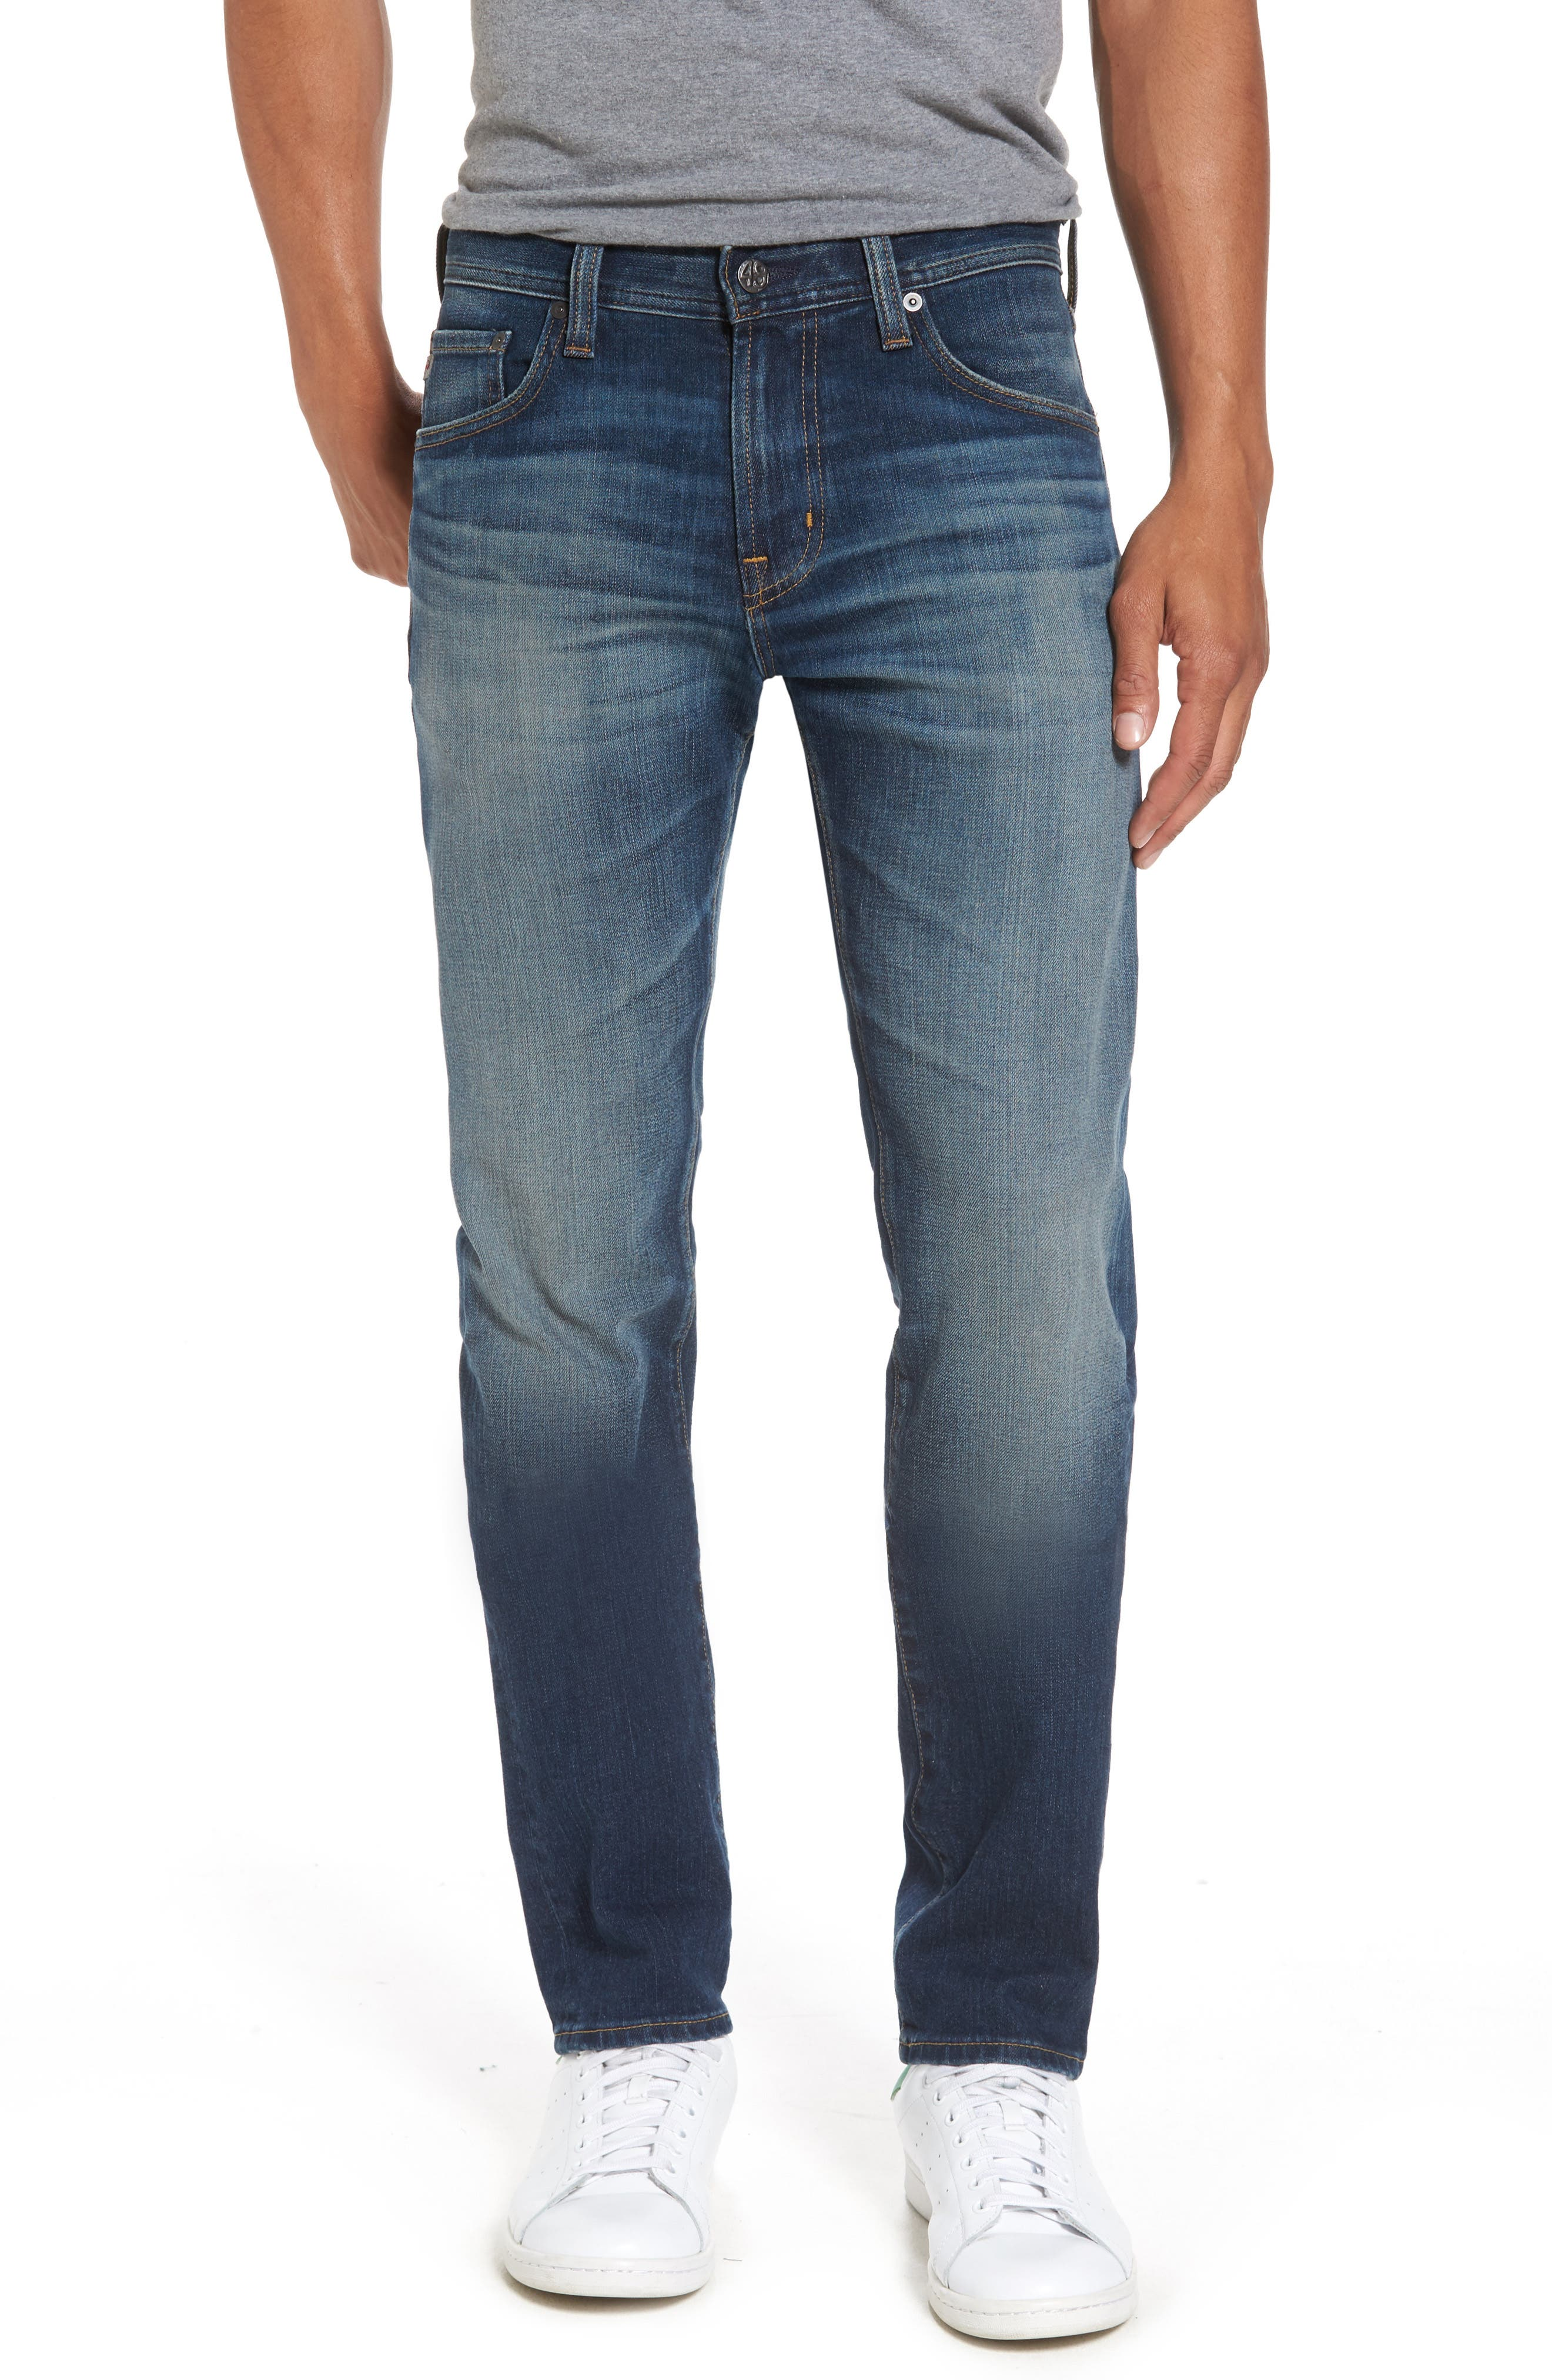 Tellis Slim Fit Jeans,                         Main,                         color, 10 Years Shortcut